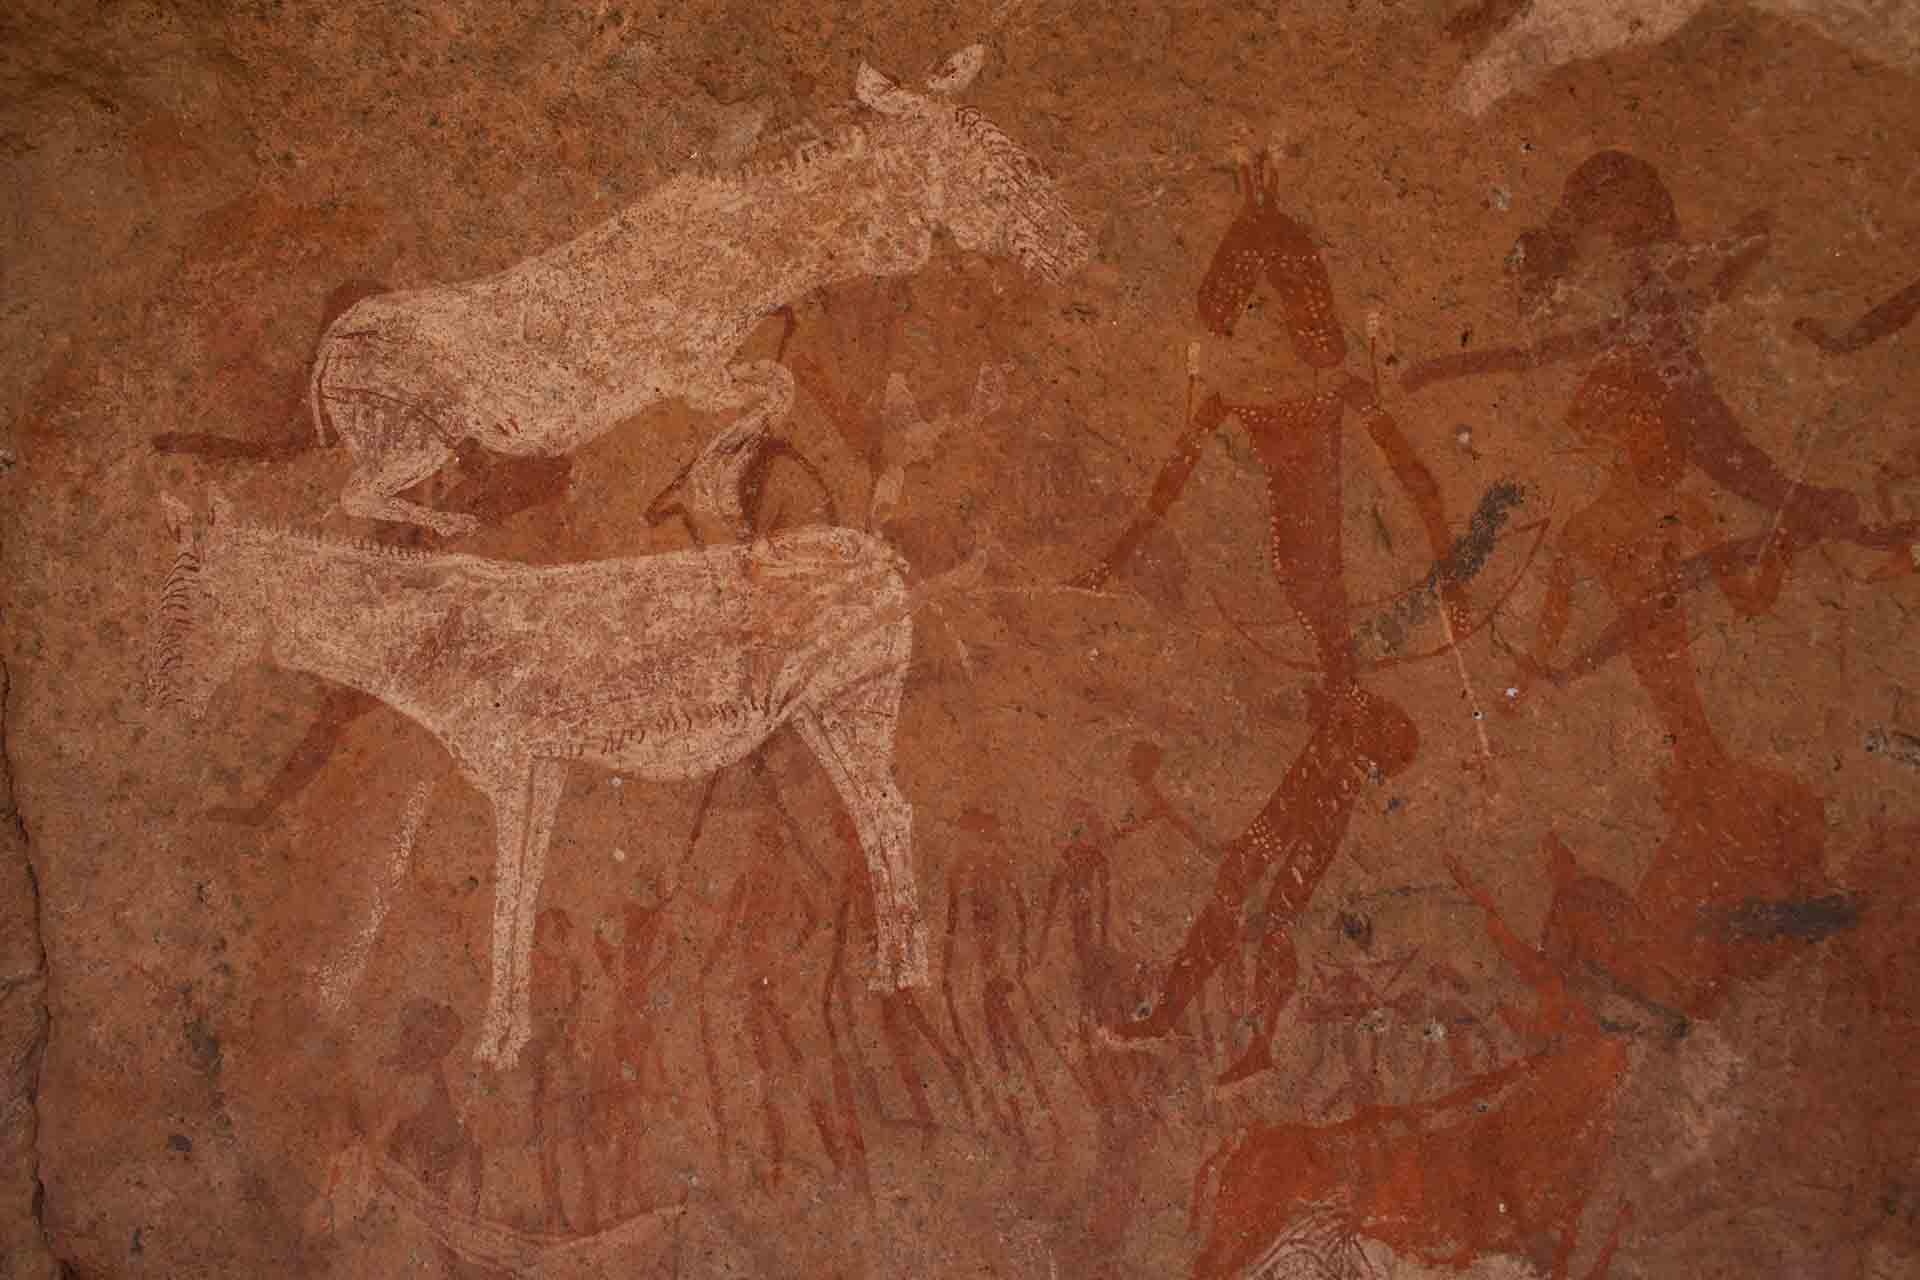 Peintures rupestres - Brandberg